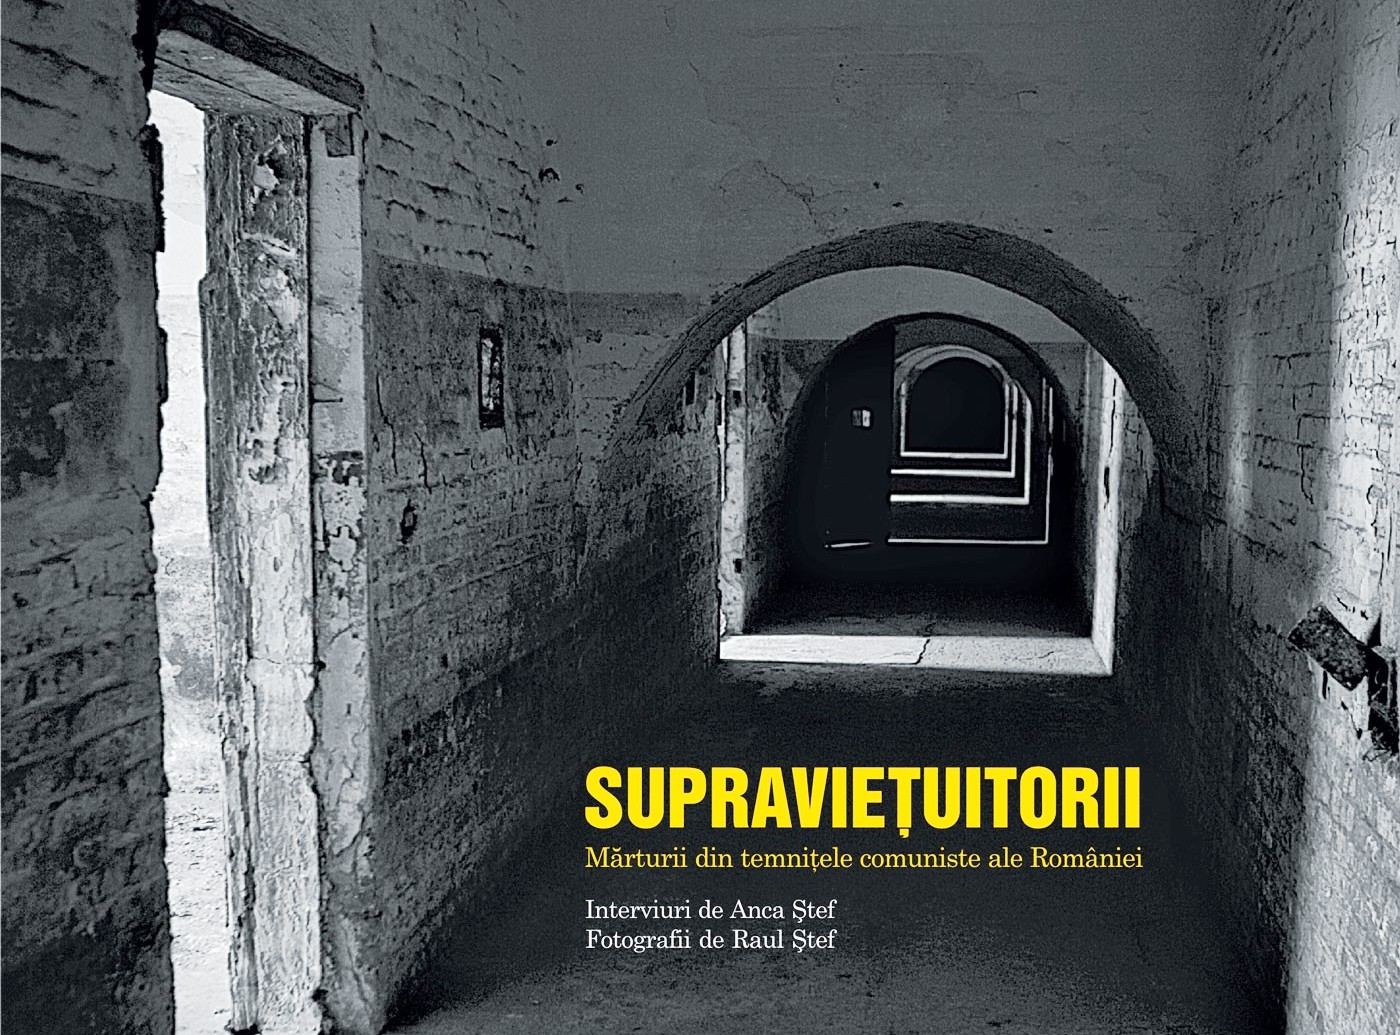 ed. humanitas. supravietuitorii e-book. L